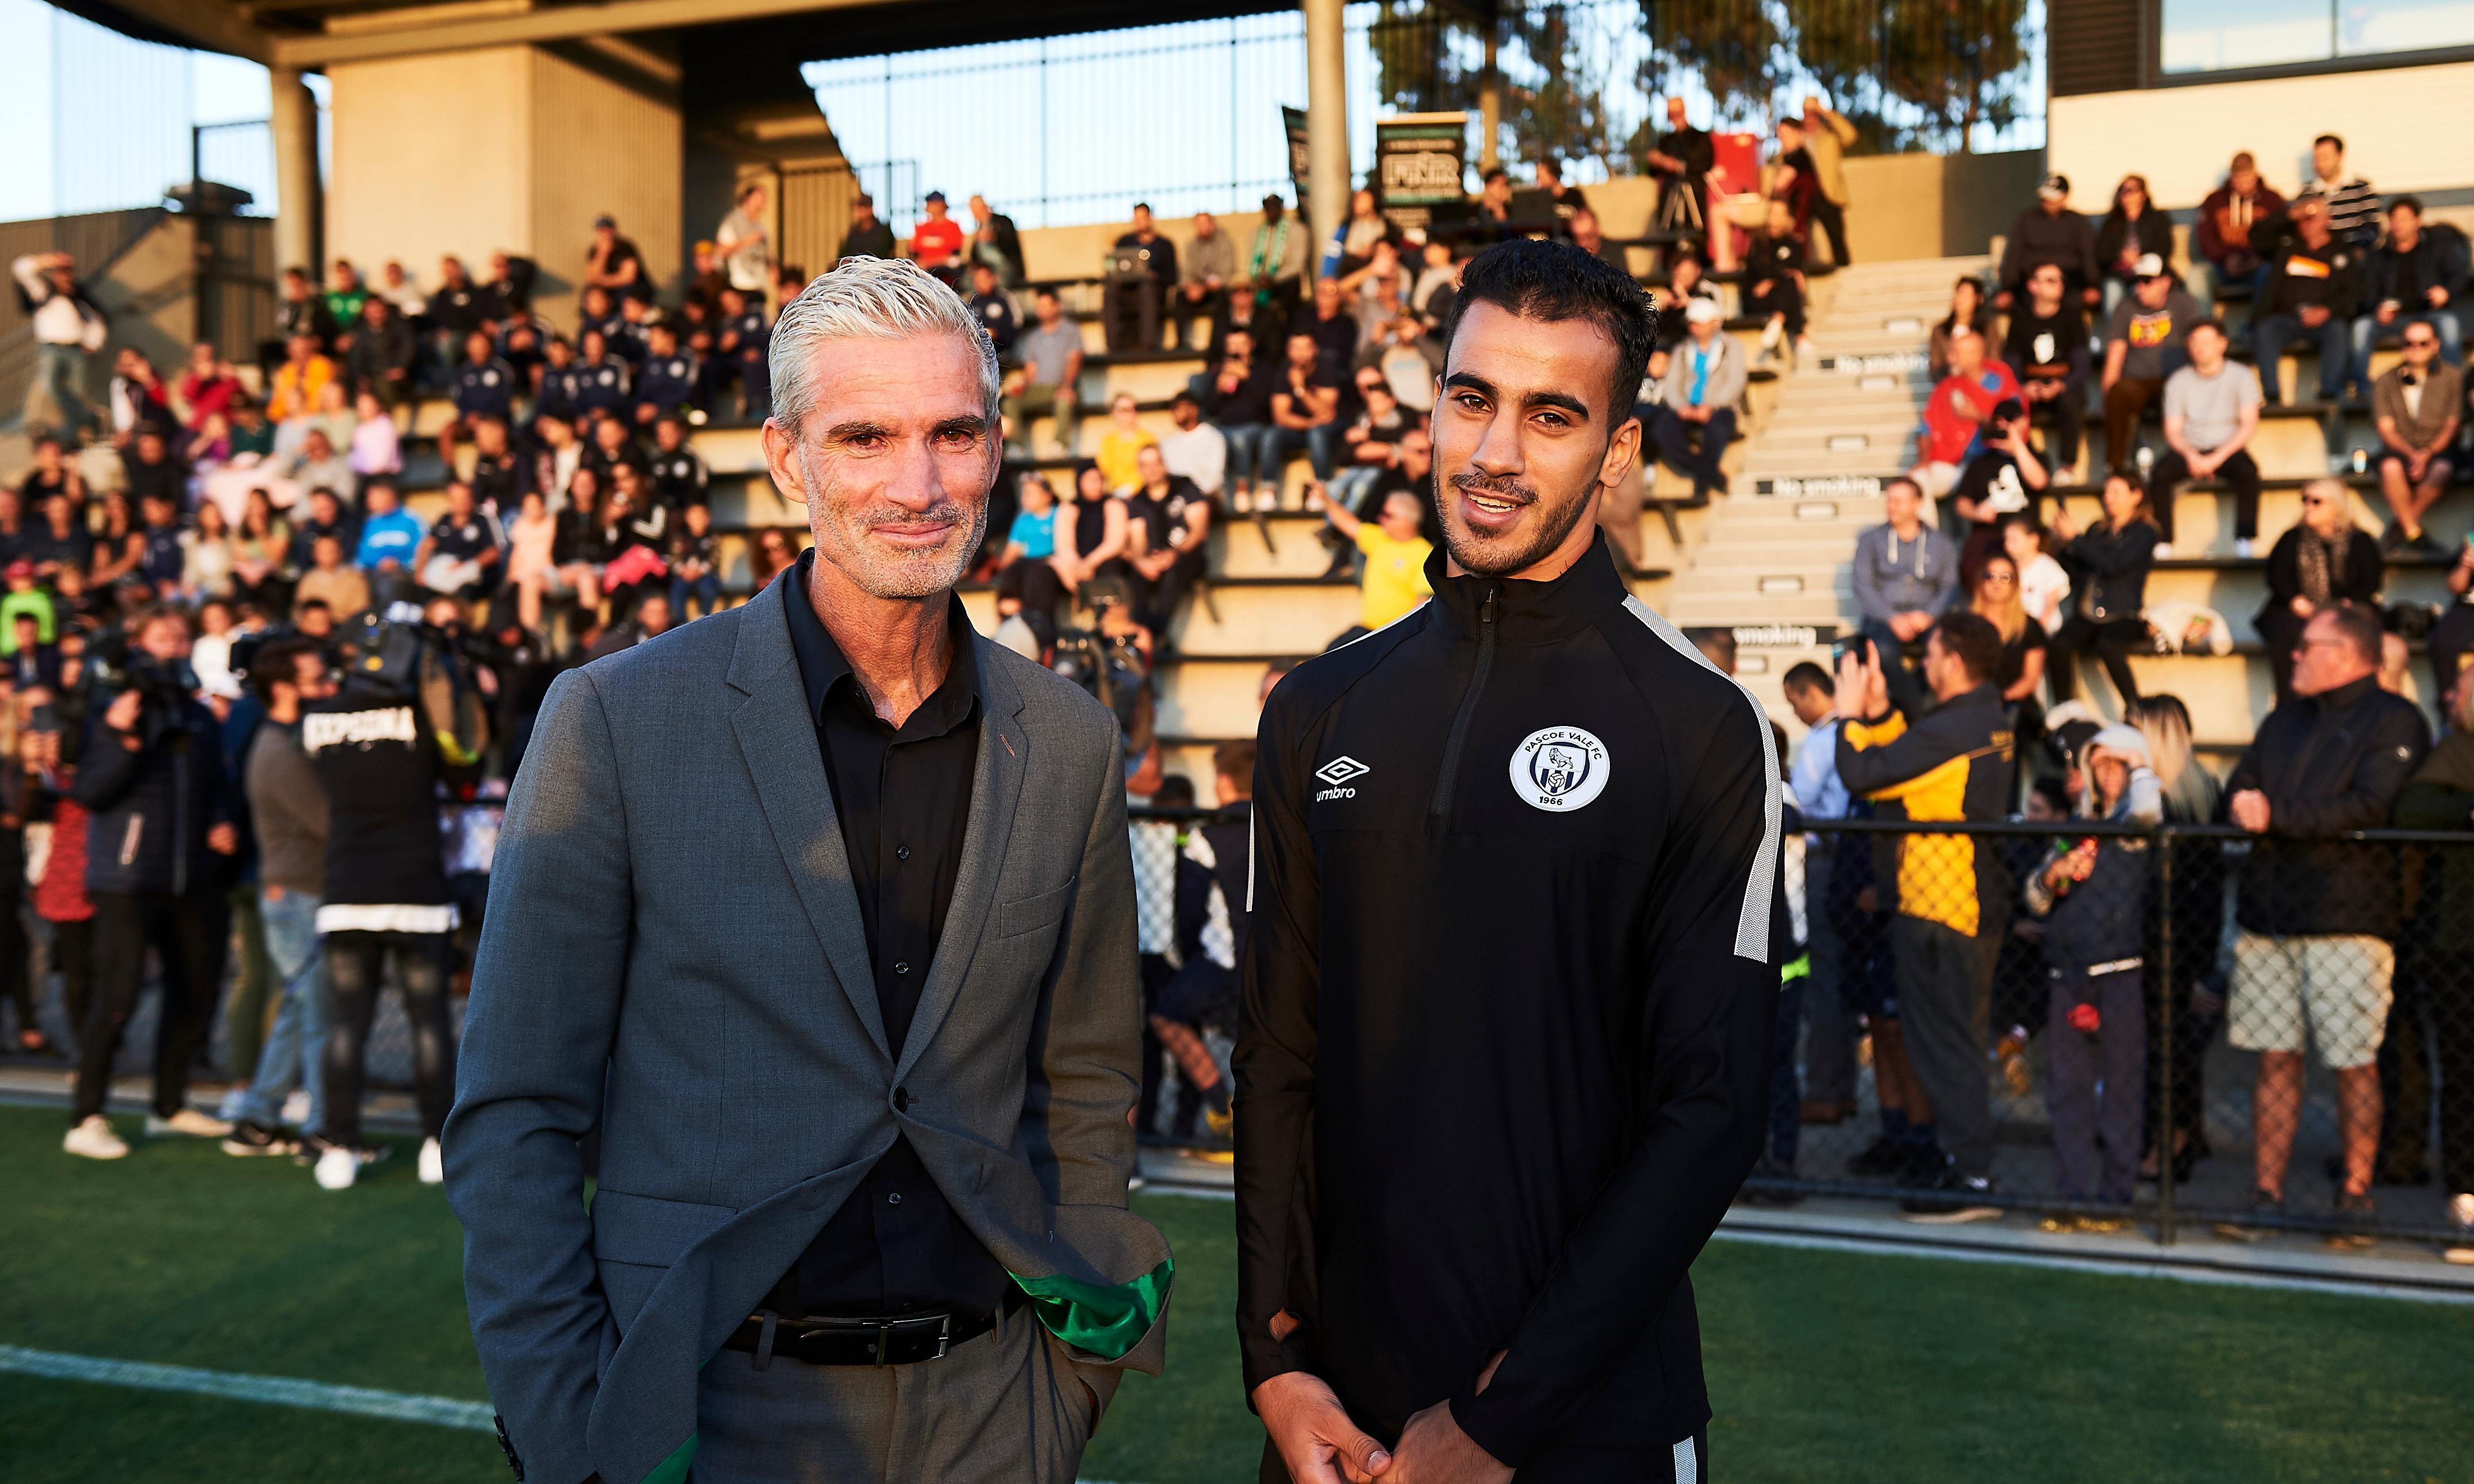 'Big surprise': Hakeem al-Araibi feels the love as he returns to football club